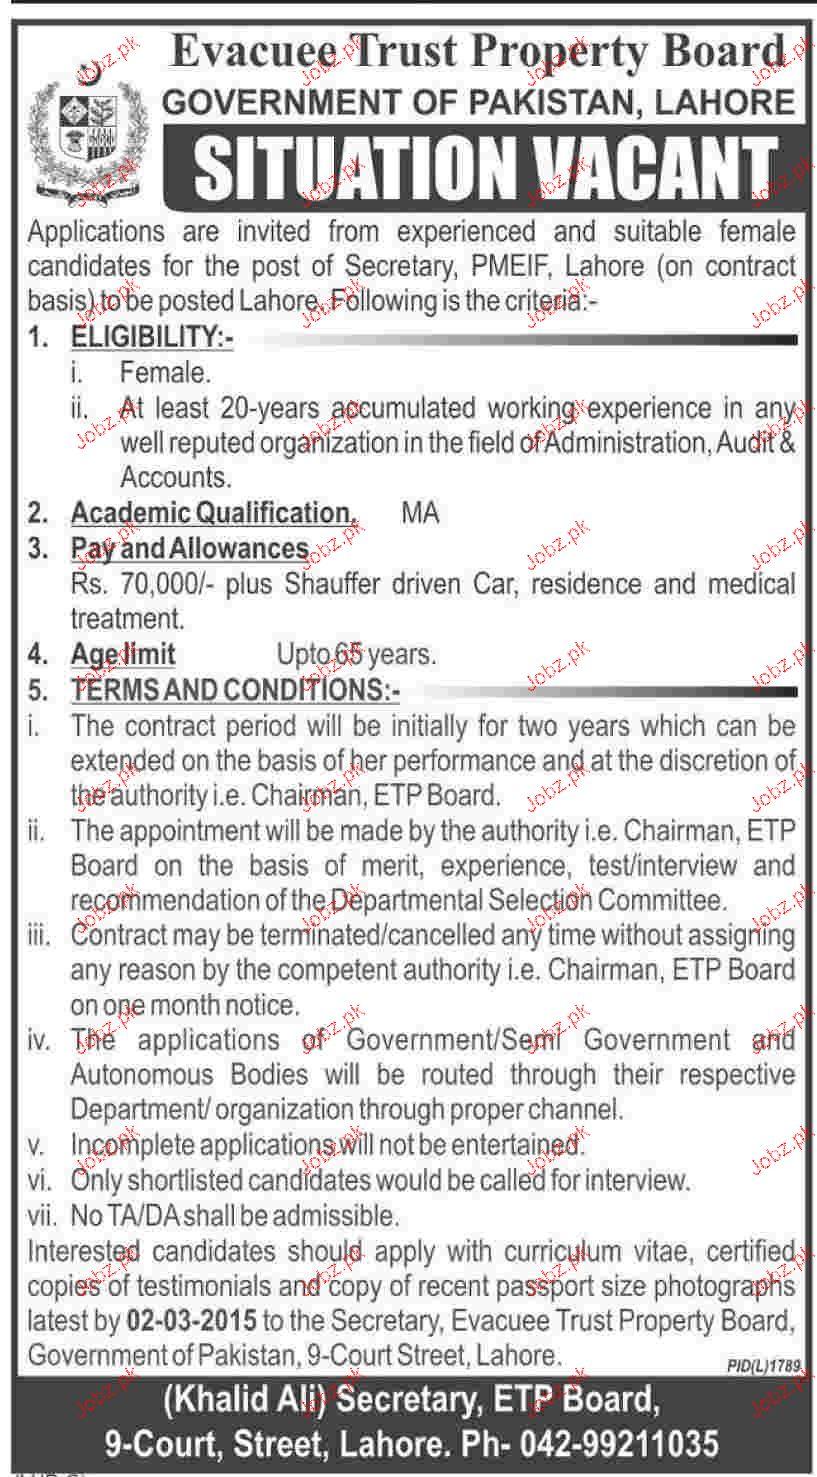 Secretary Job Opportunity